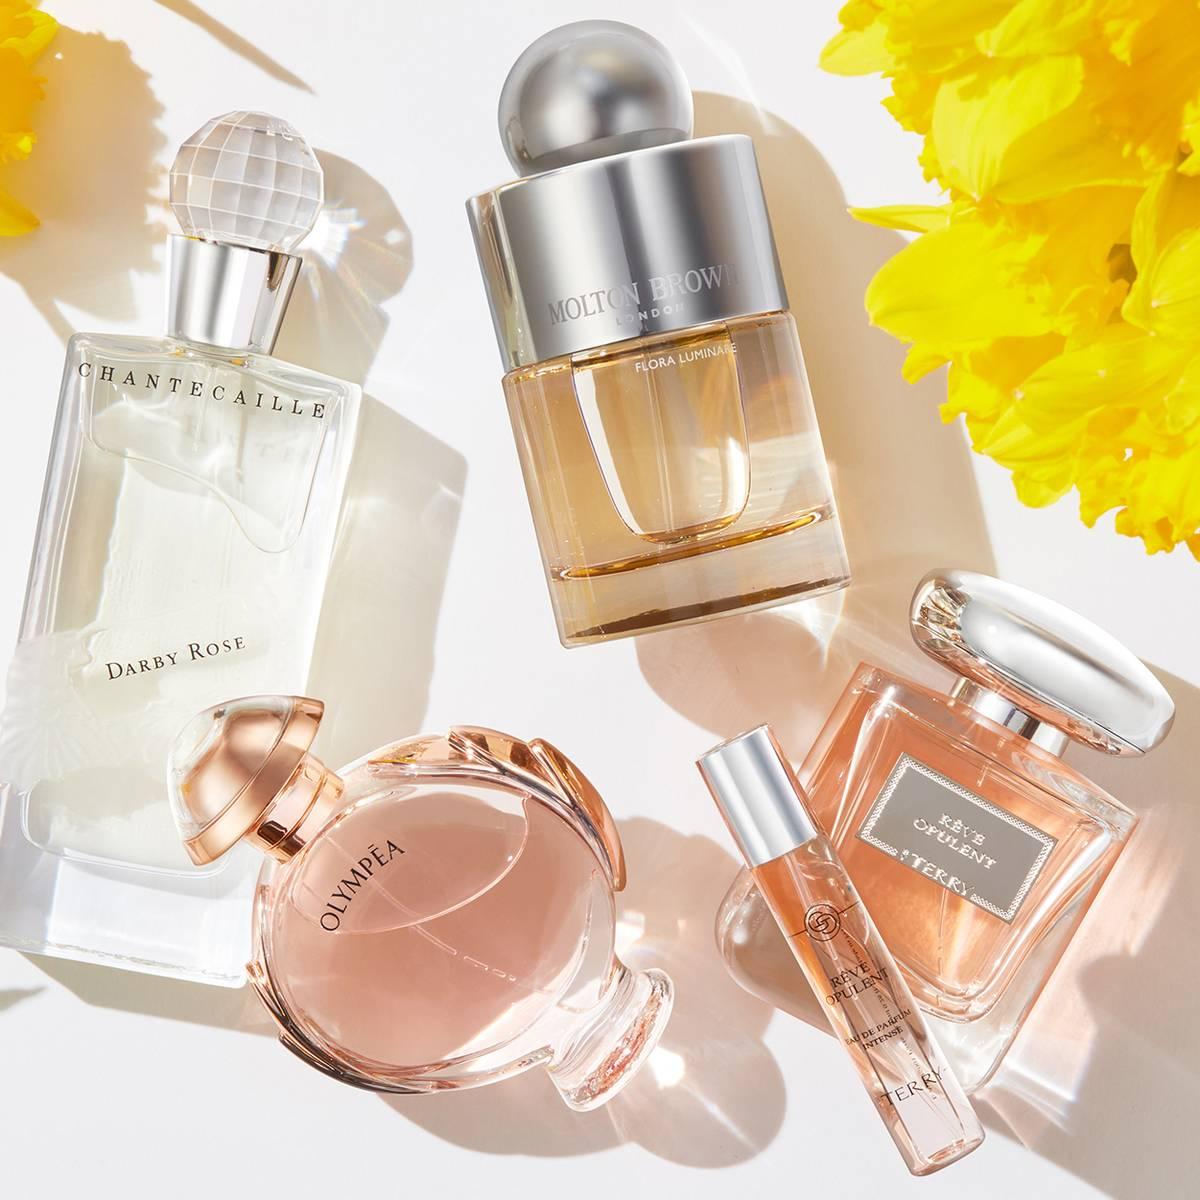 lasting scents